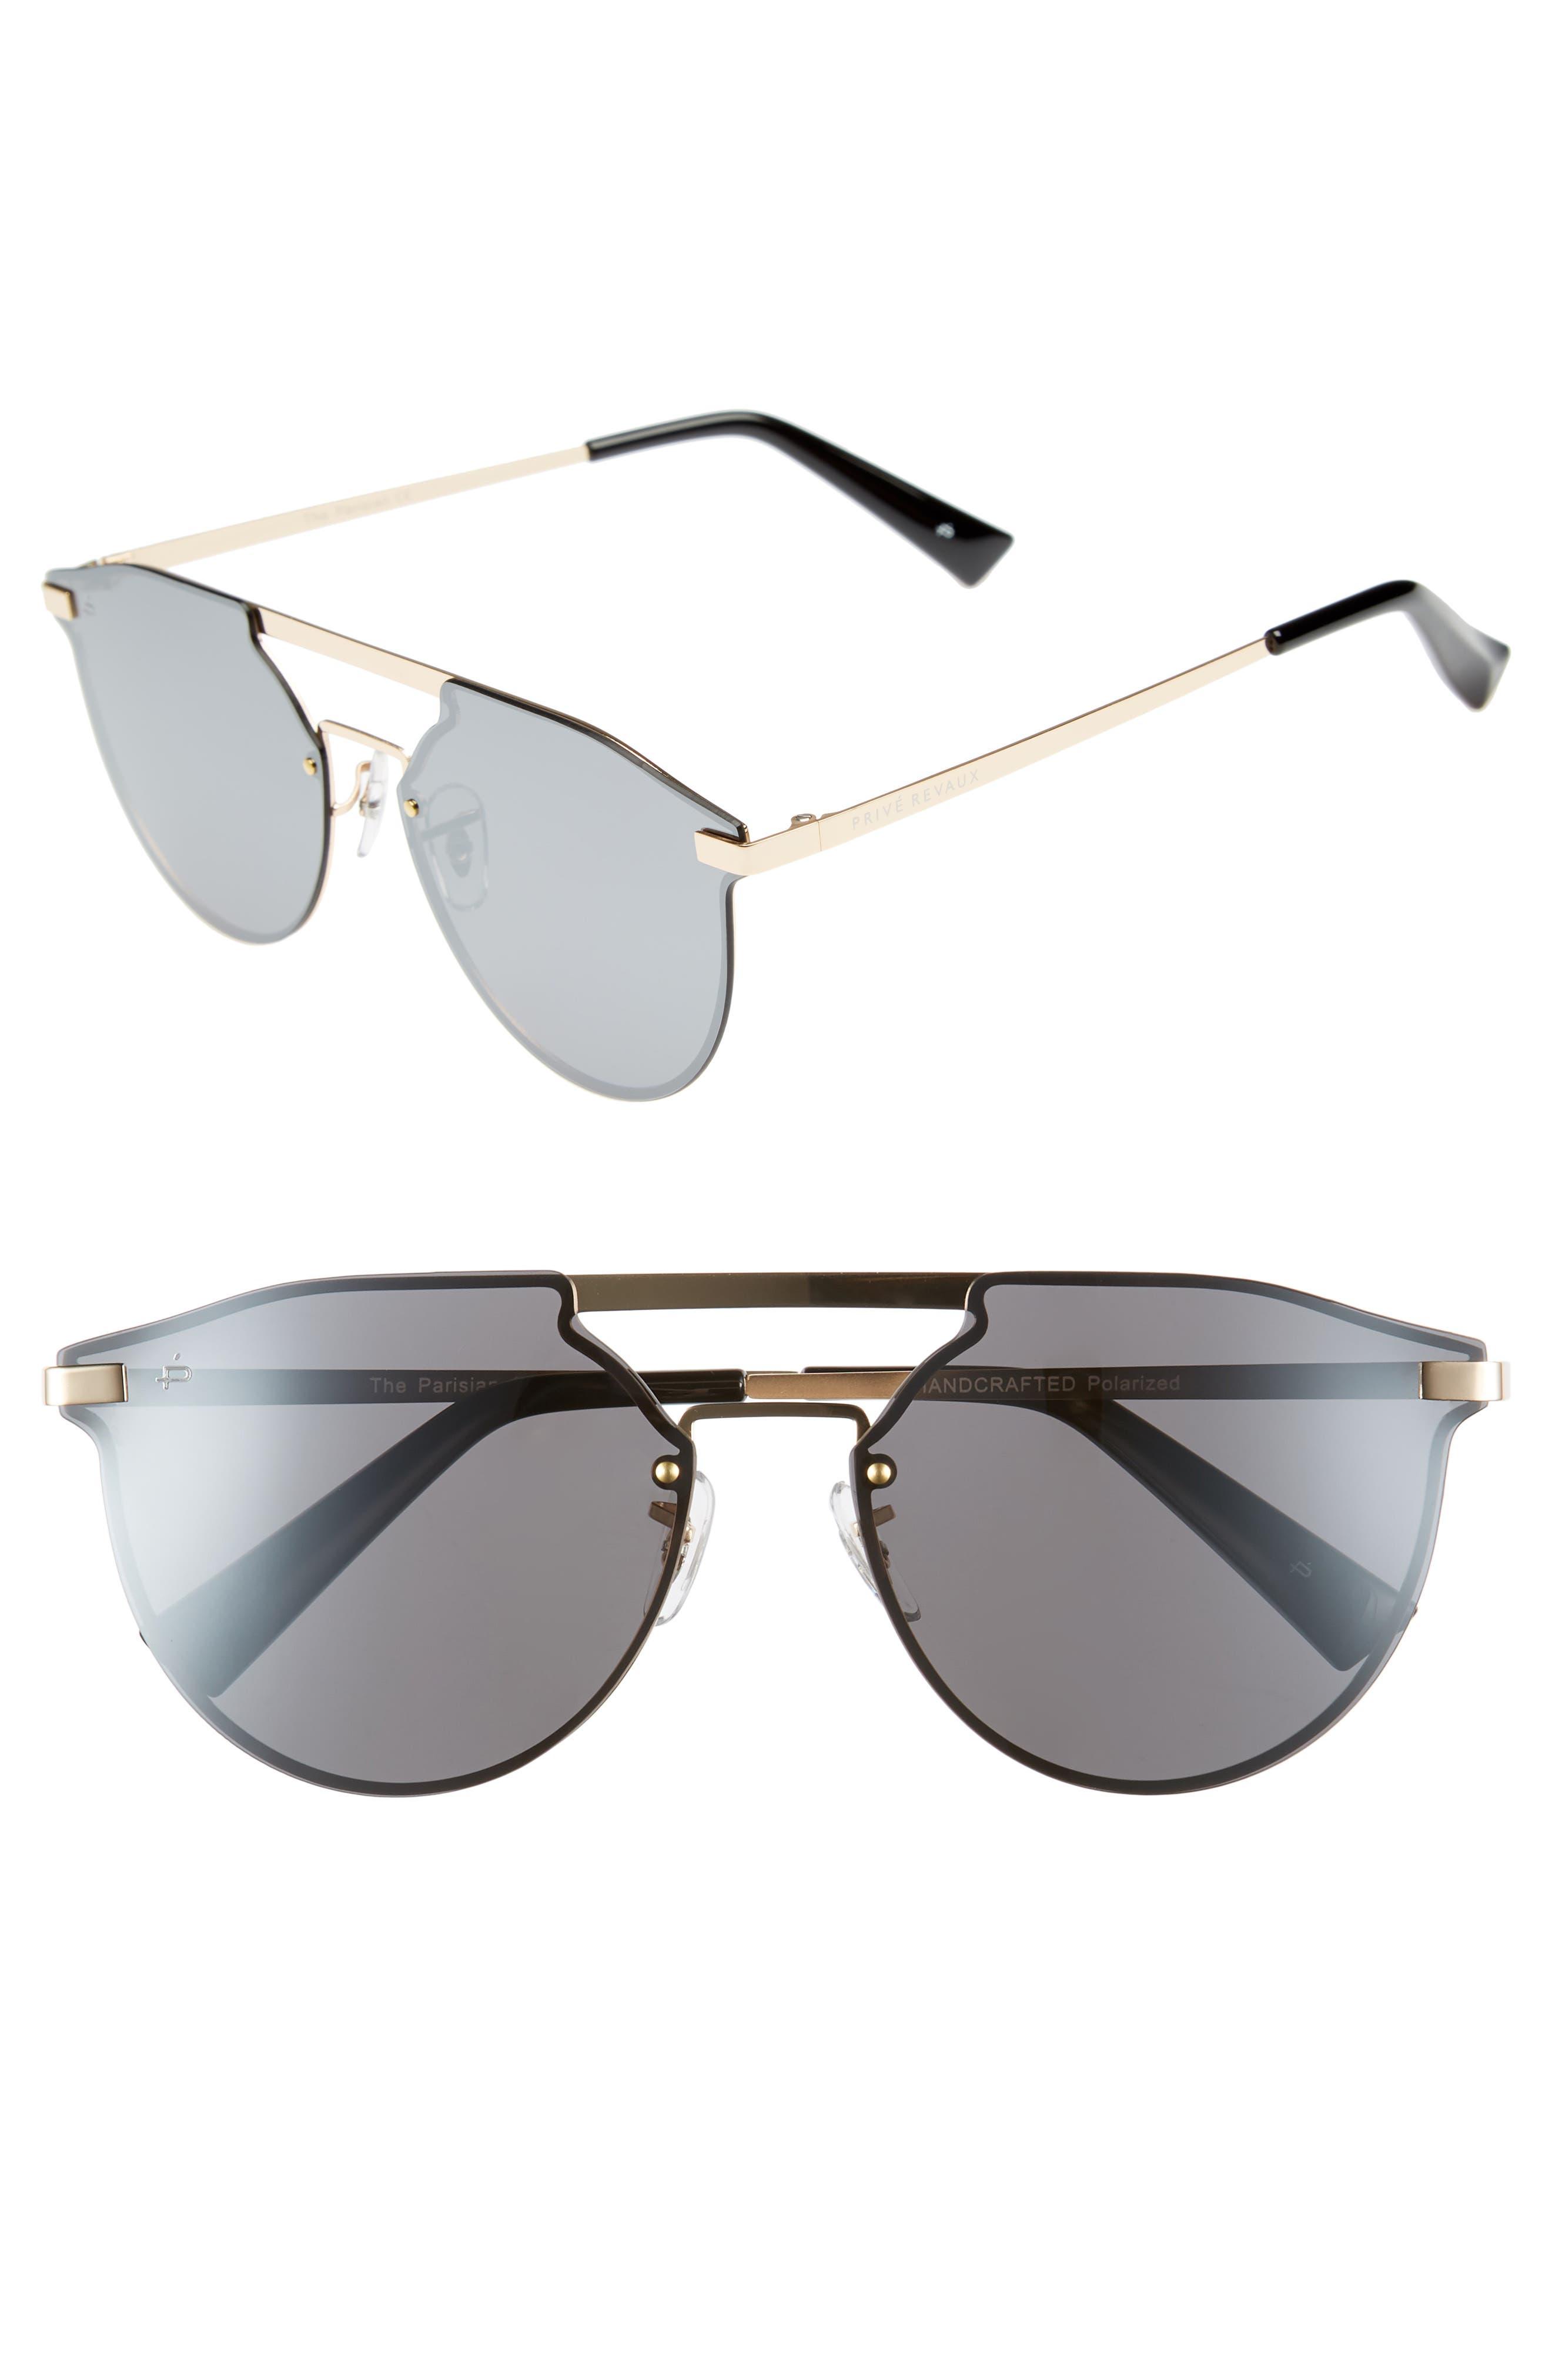 Privé Revaux The Parisian 62mm Aviator Sunglasses,                             Main thumbnail 1, color,                             040